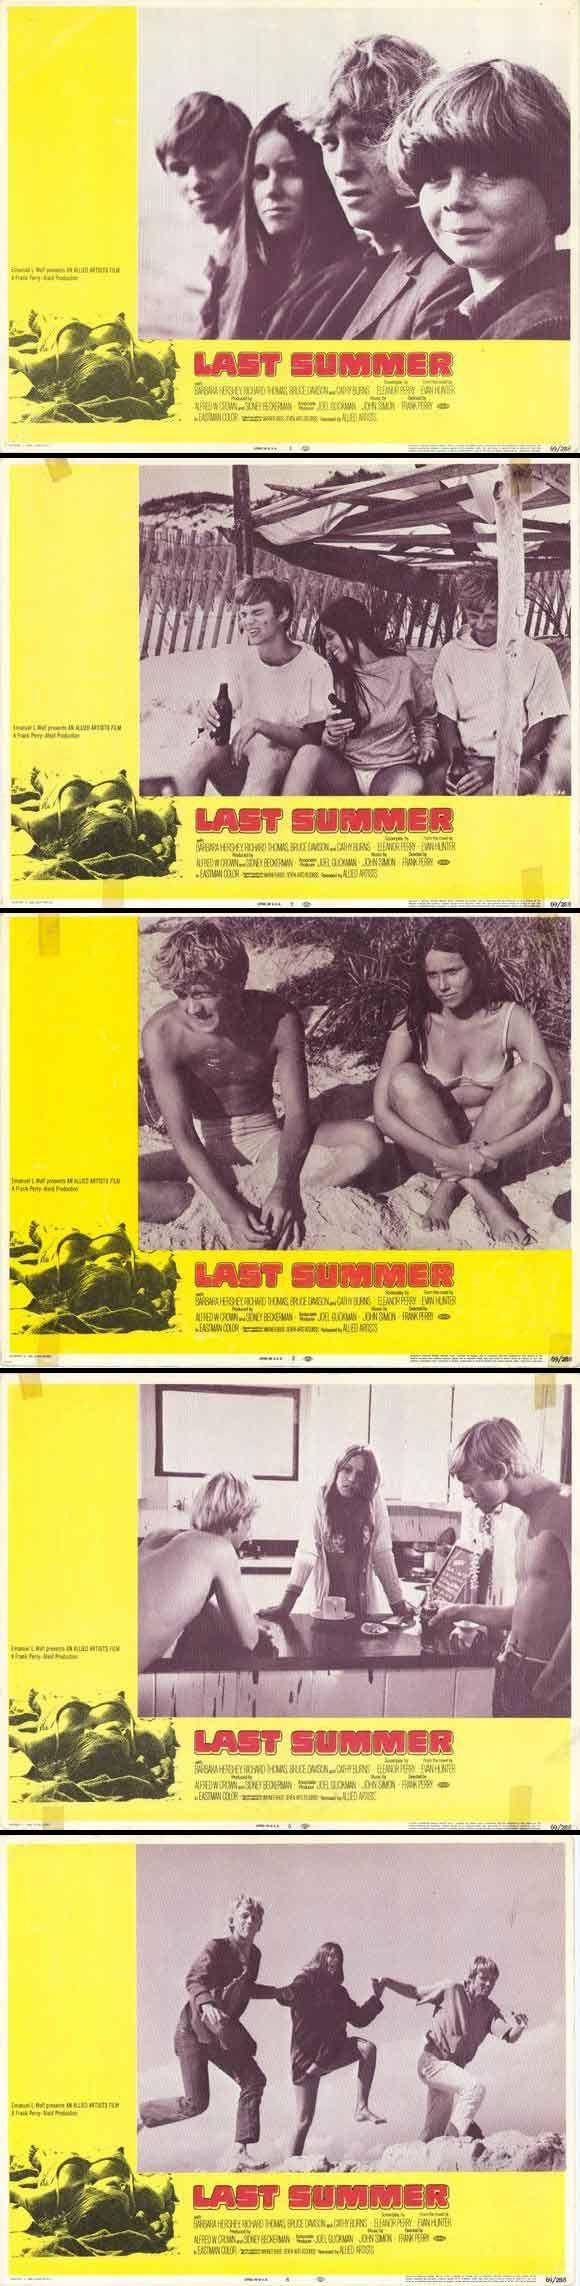 Last Summer (1969) starring Barbara Hershey, Richard Thomas, Bruce Davison & Catherine Burns